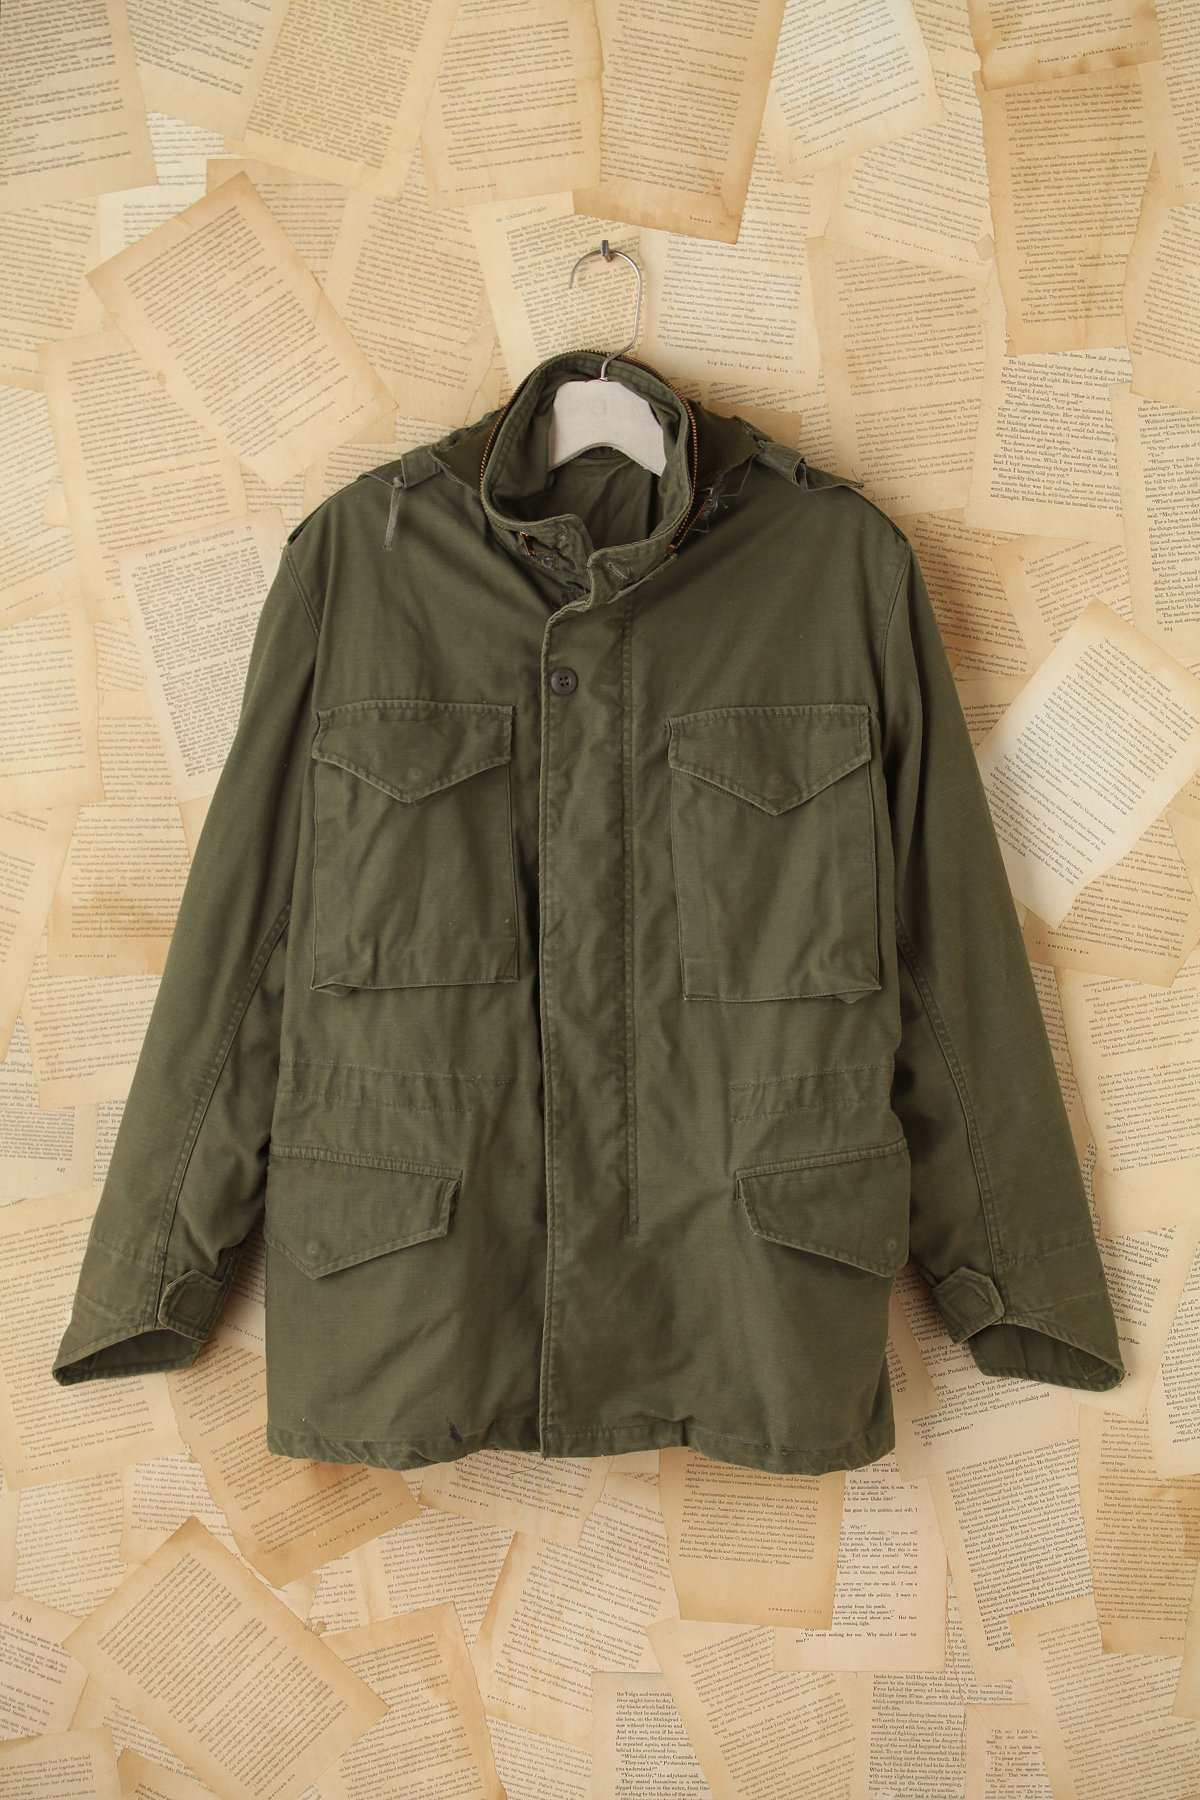 Vintage Hooded Miltary Cargo Jacket